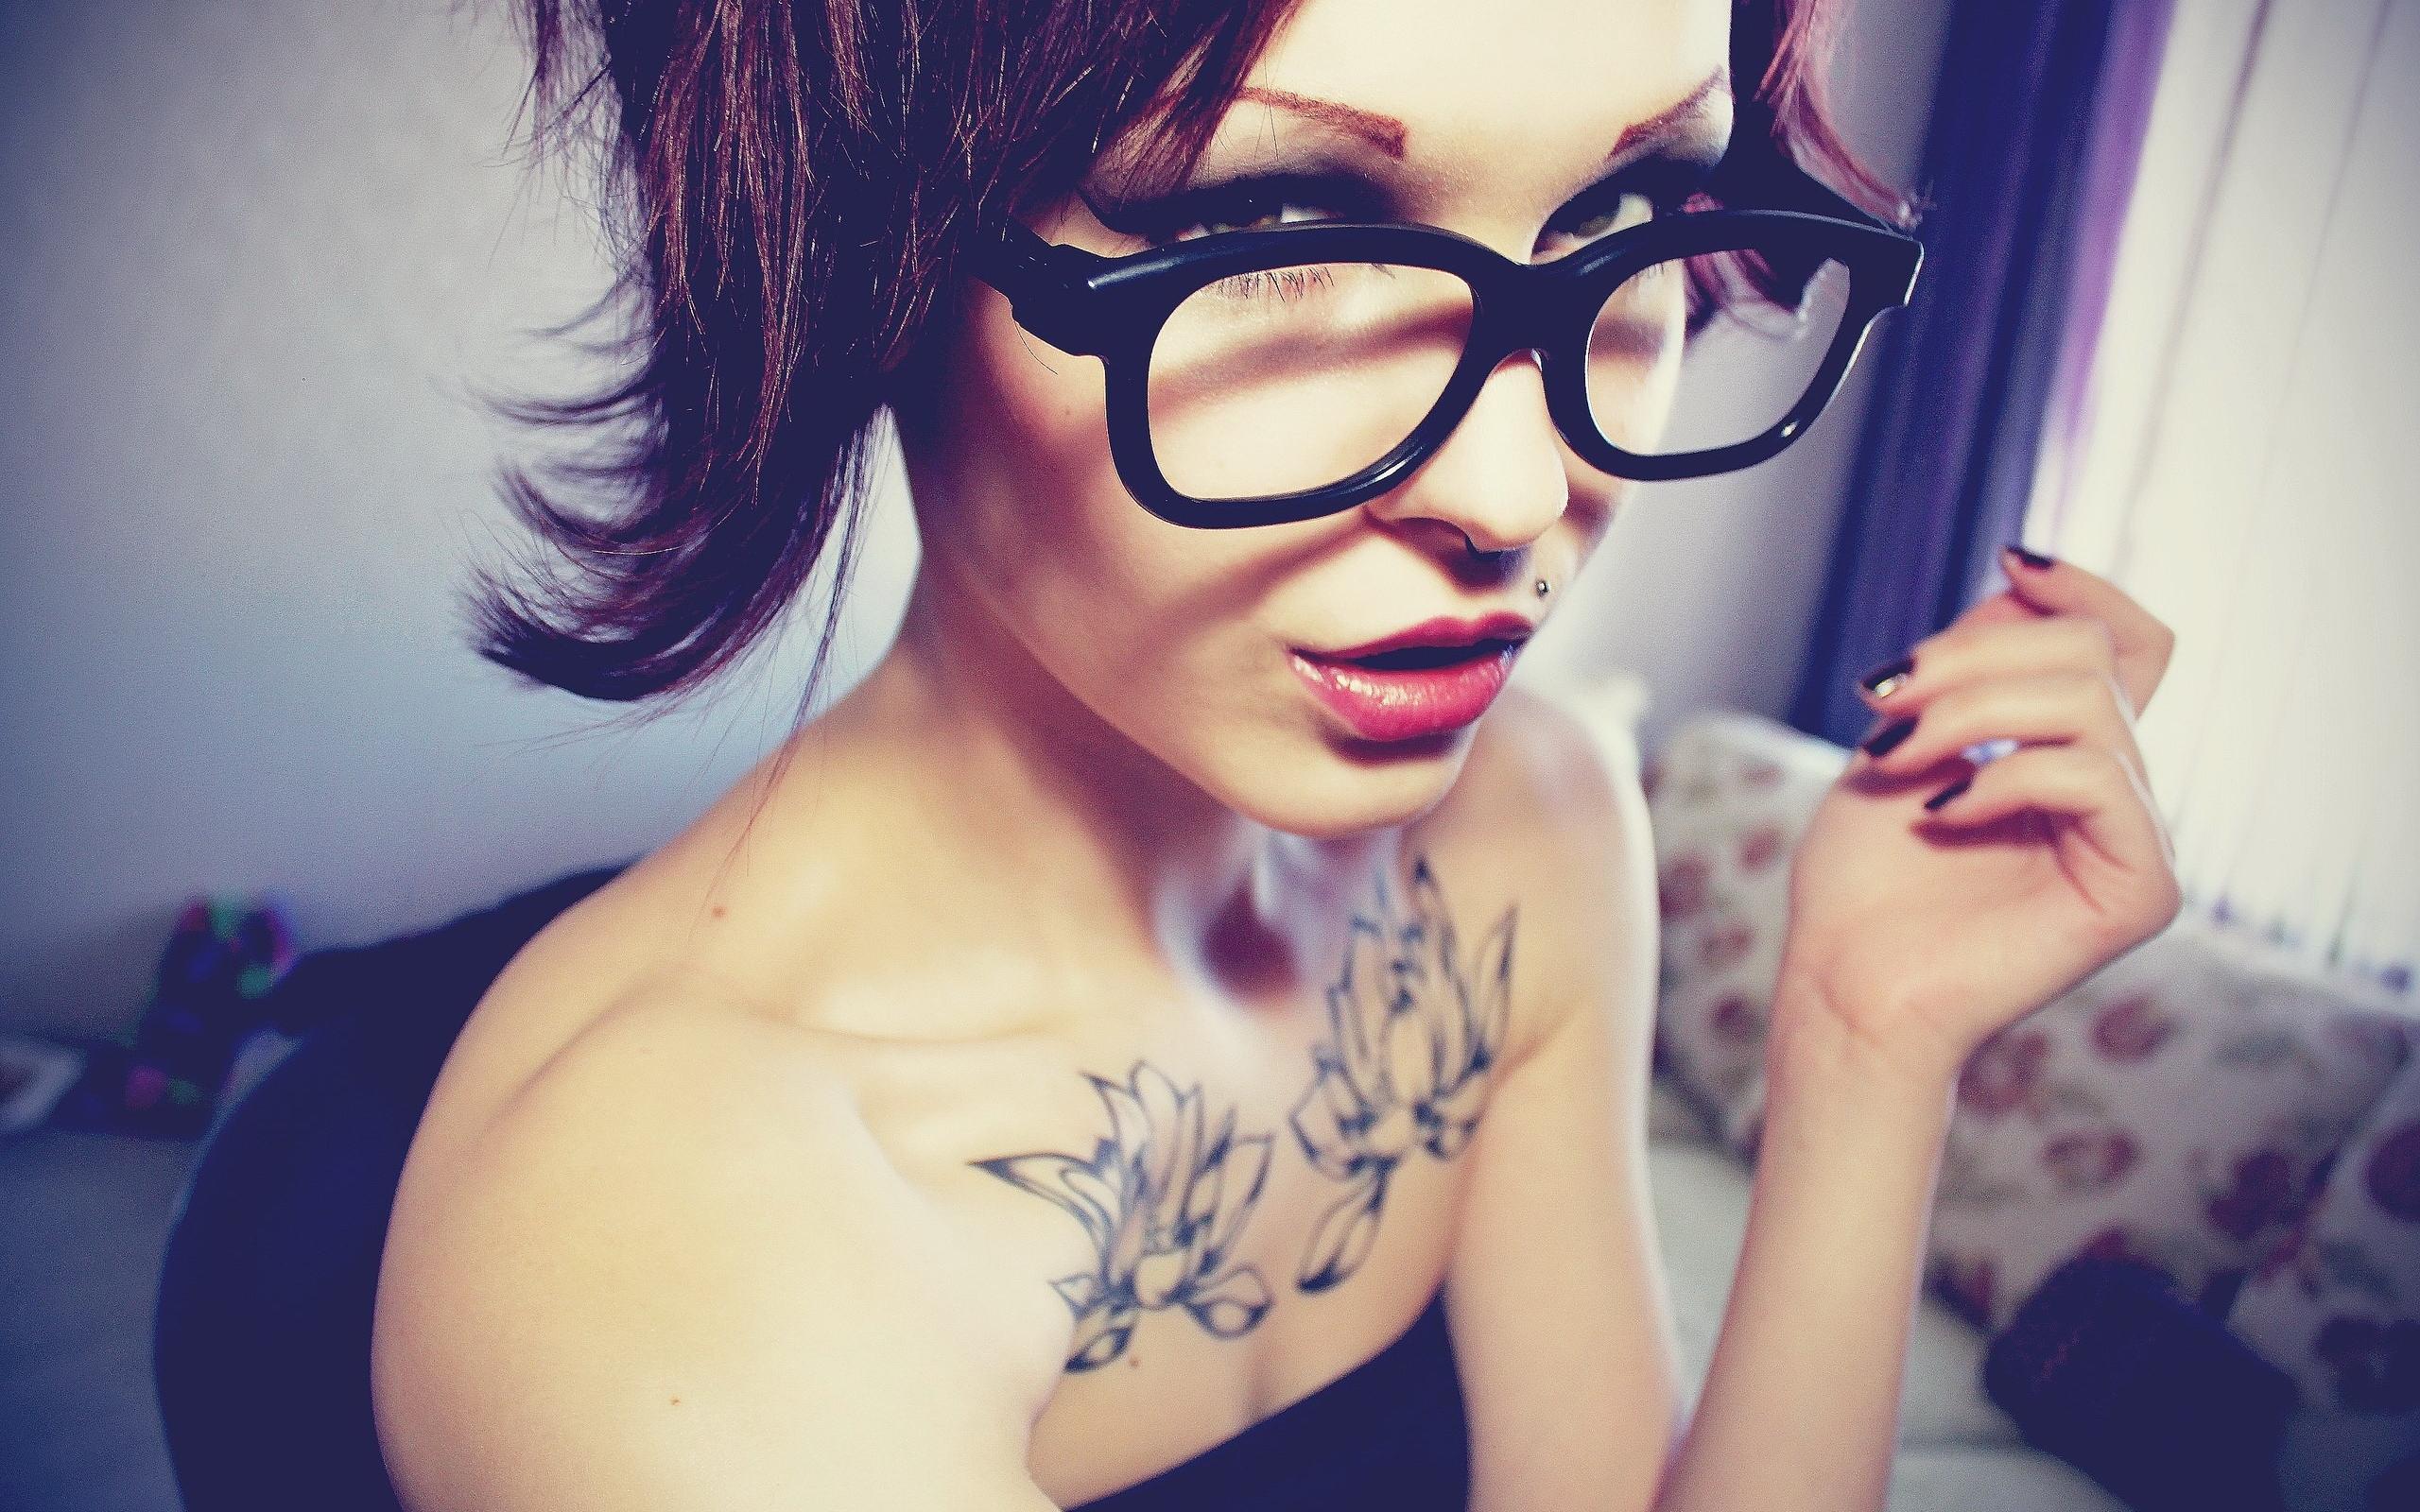 брюнетка, глаза, очки